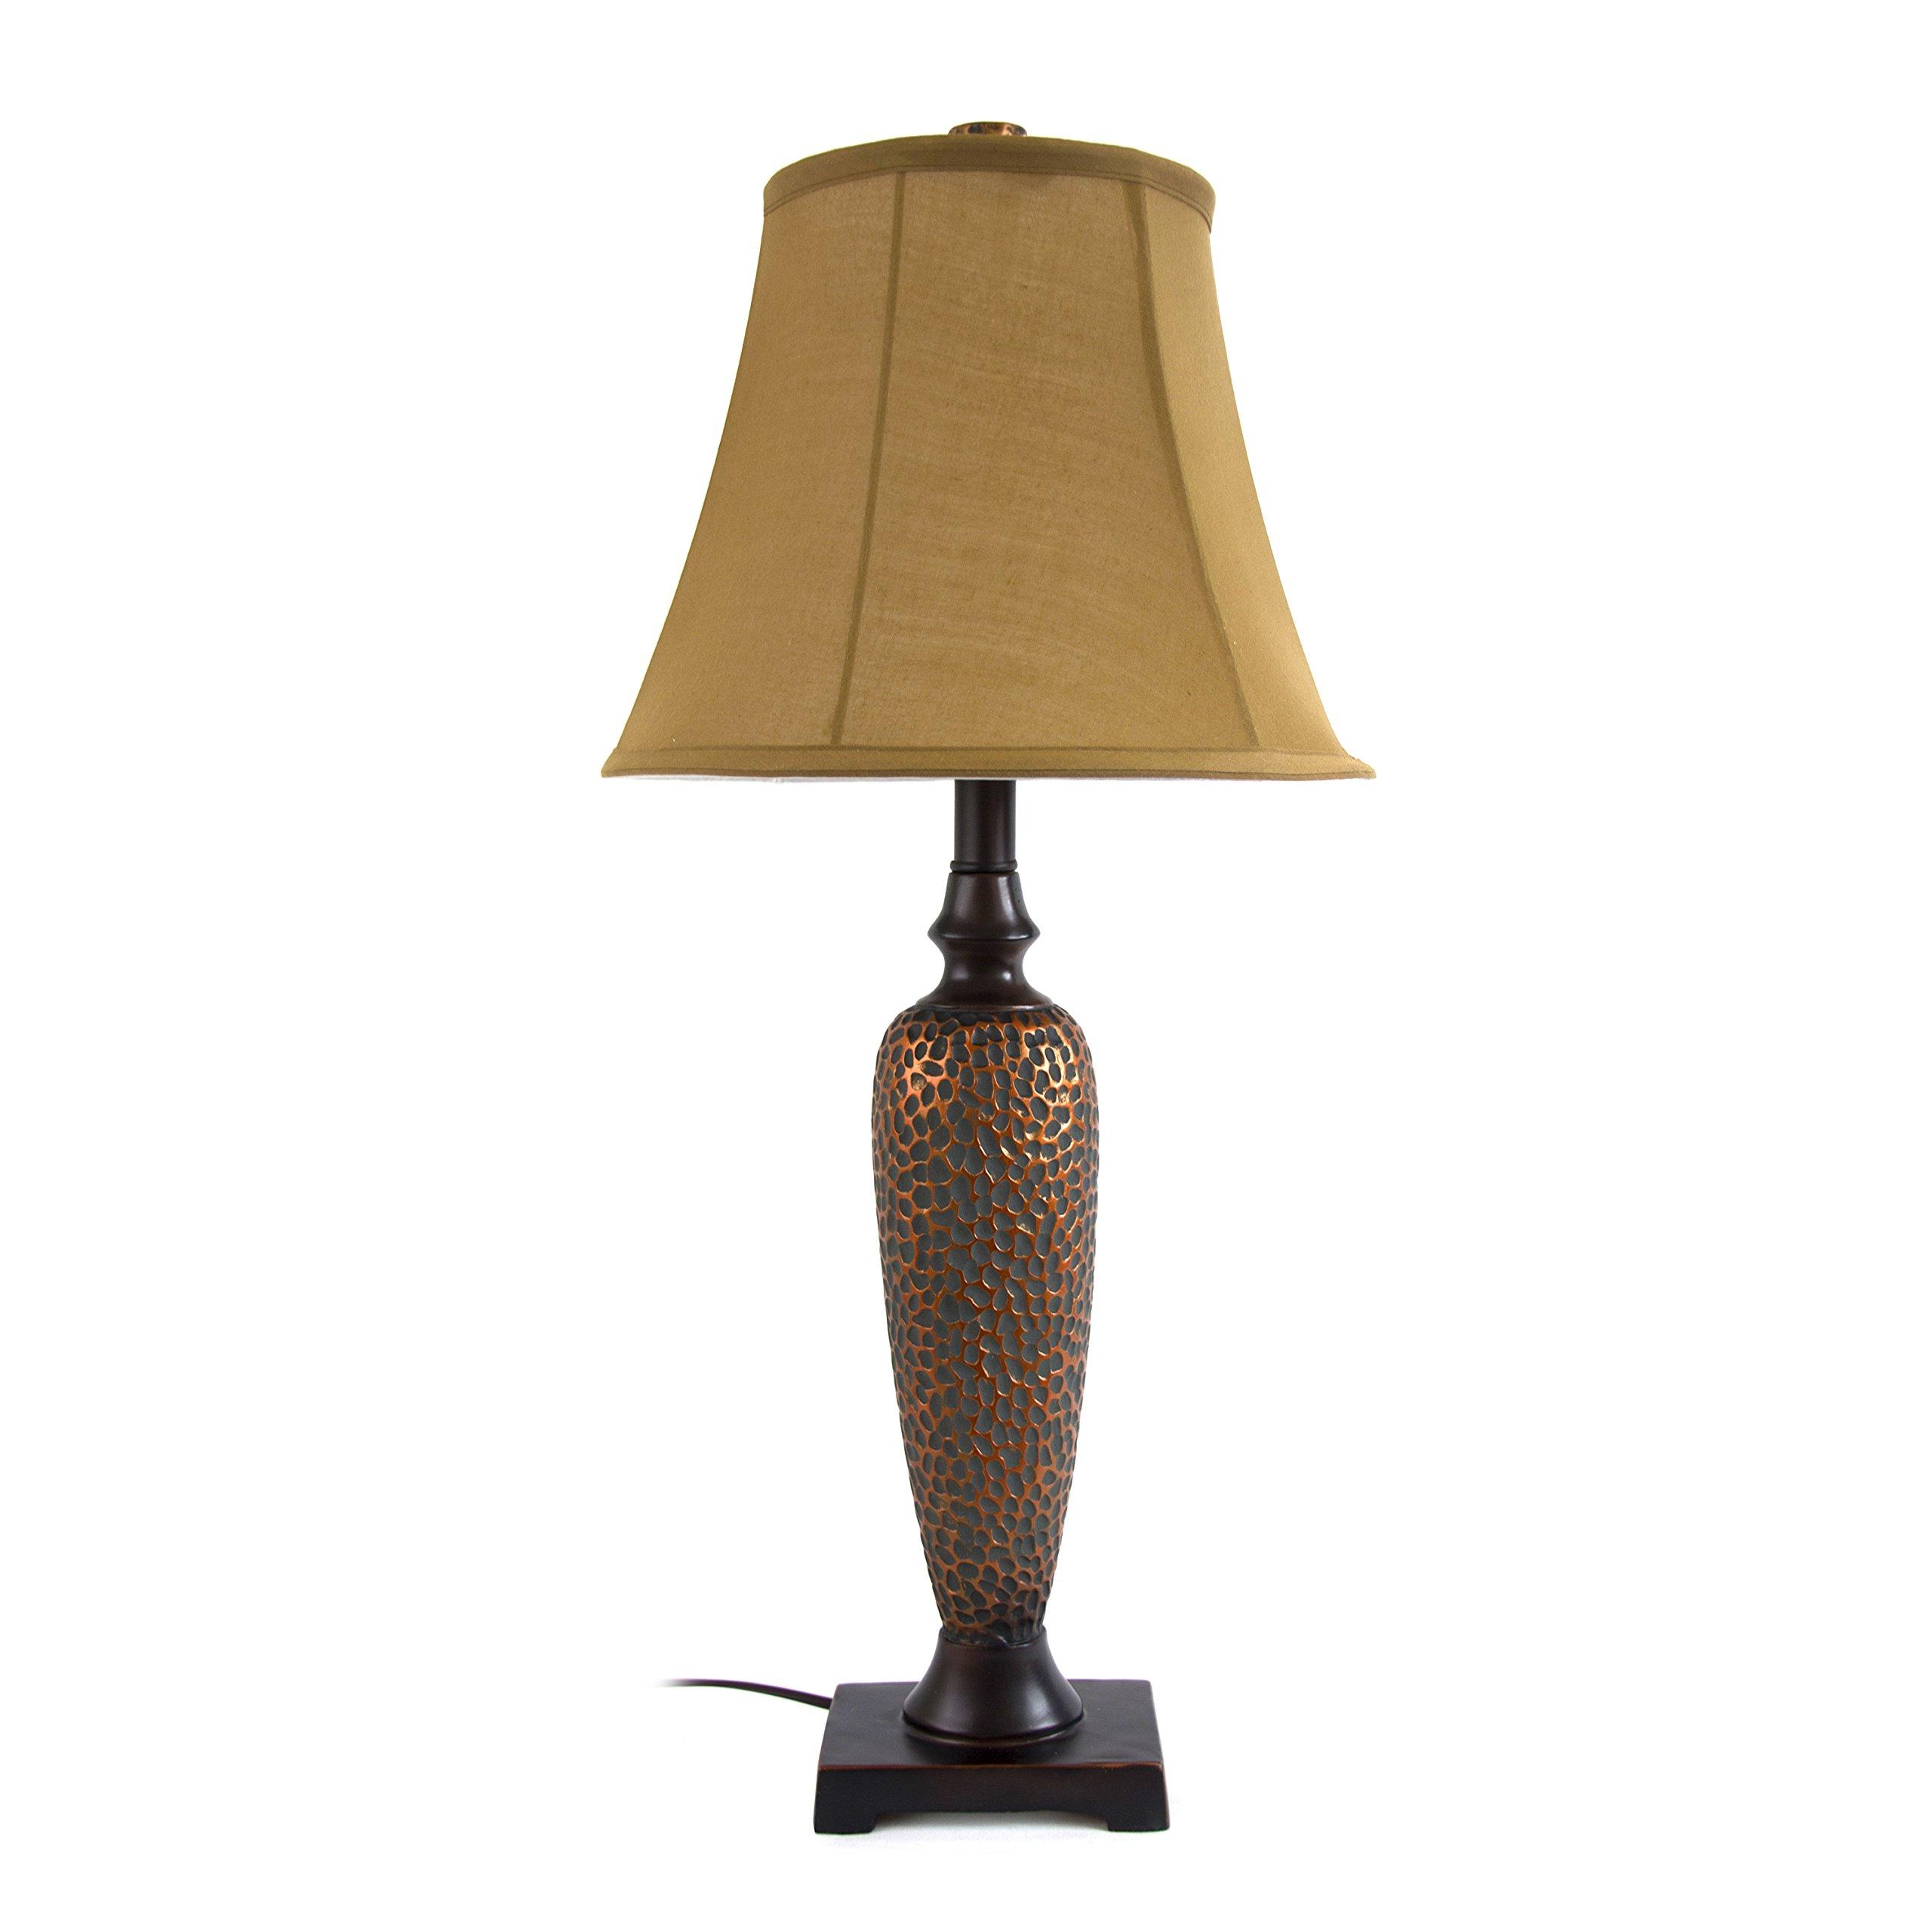 Elegant Designs LC1000-HBZ Lamp Set by Elegant Designs (Image #5)